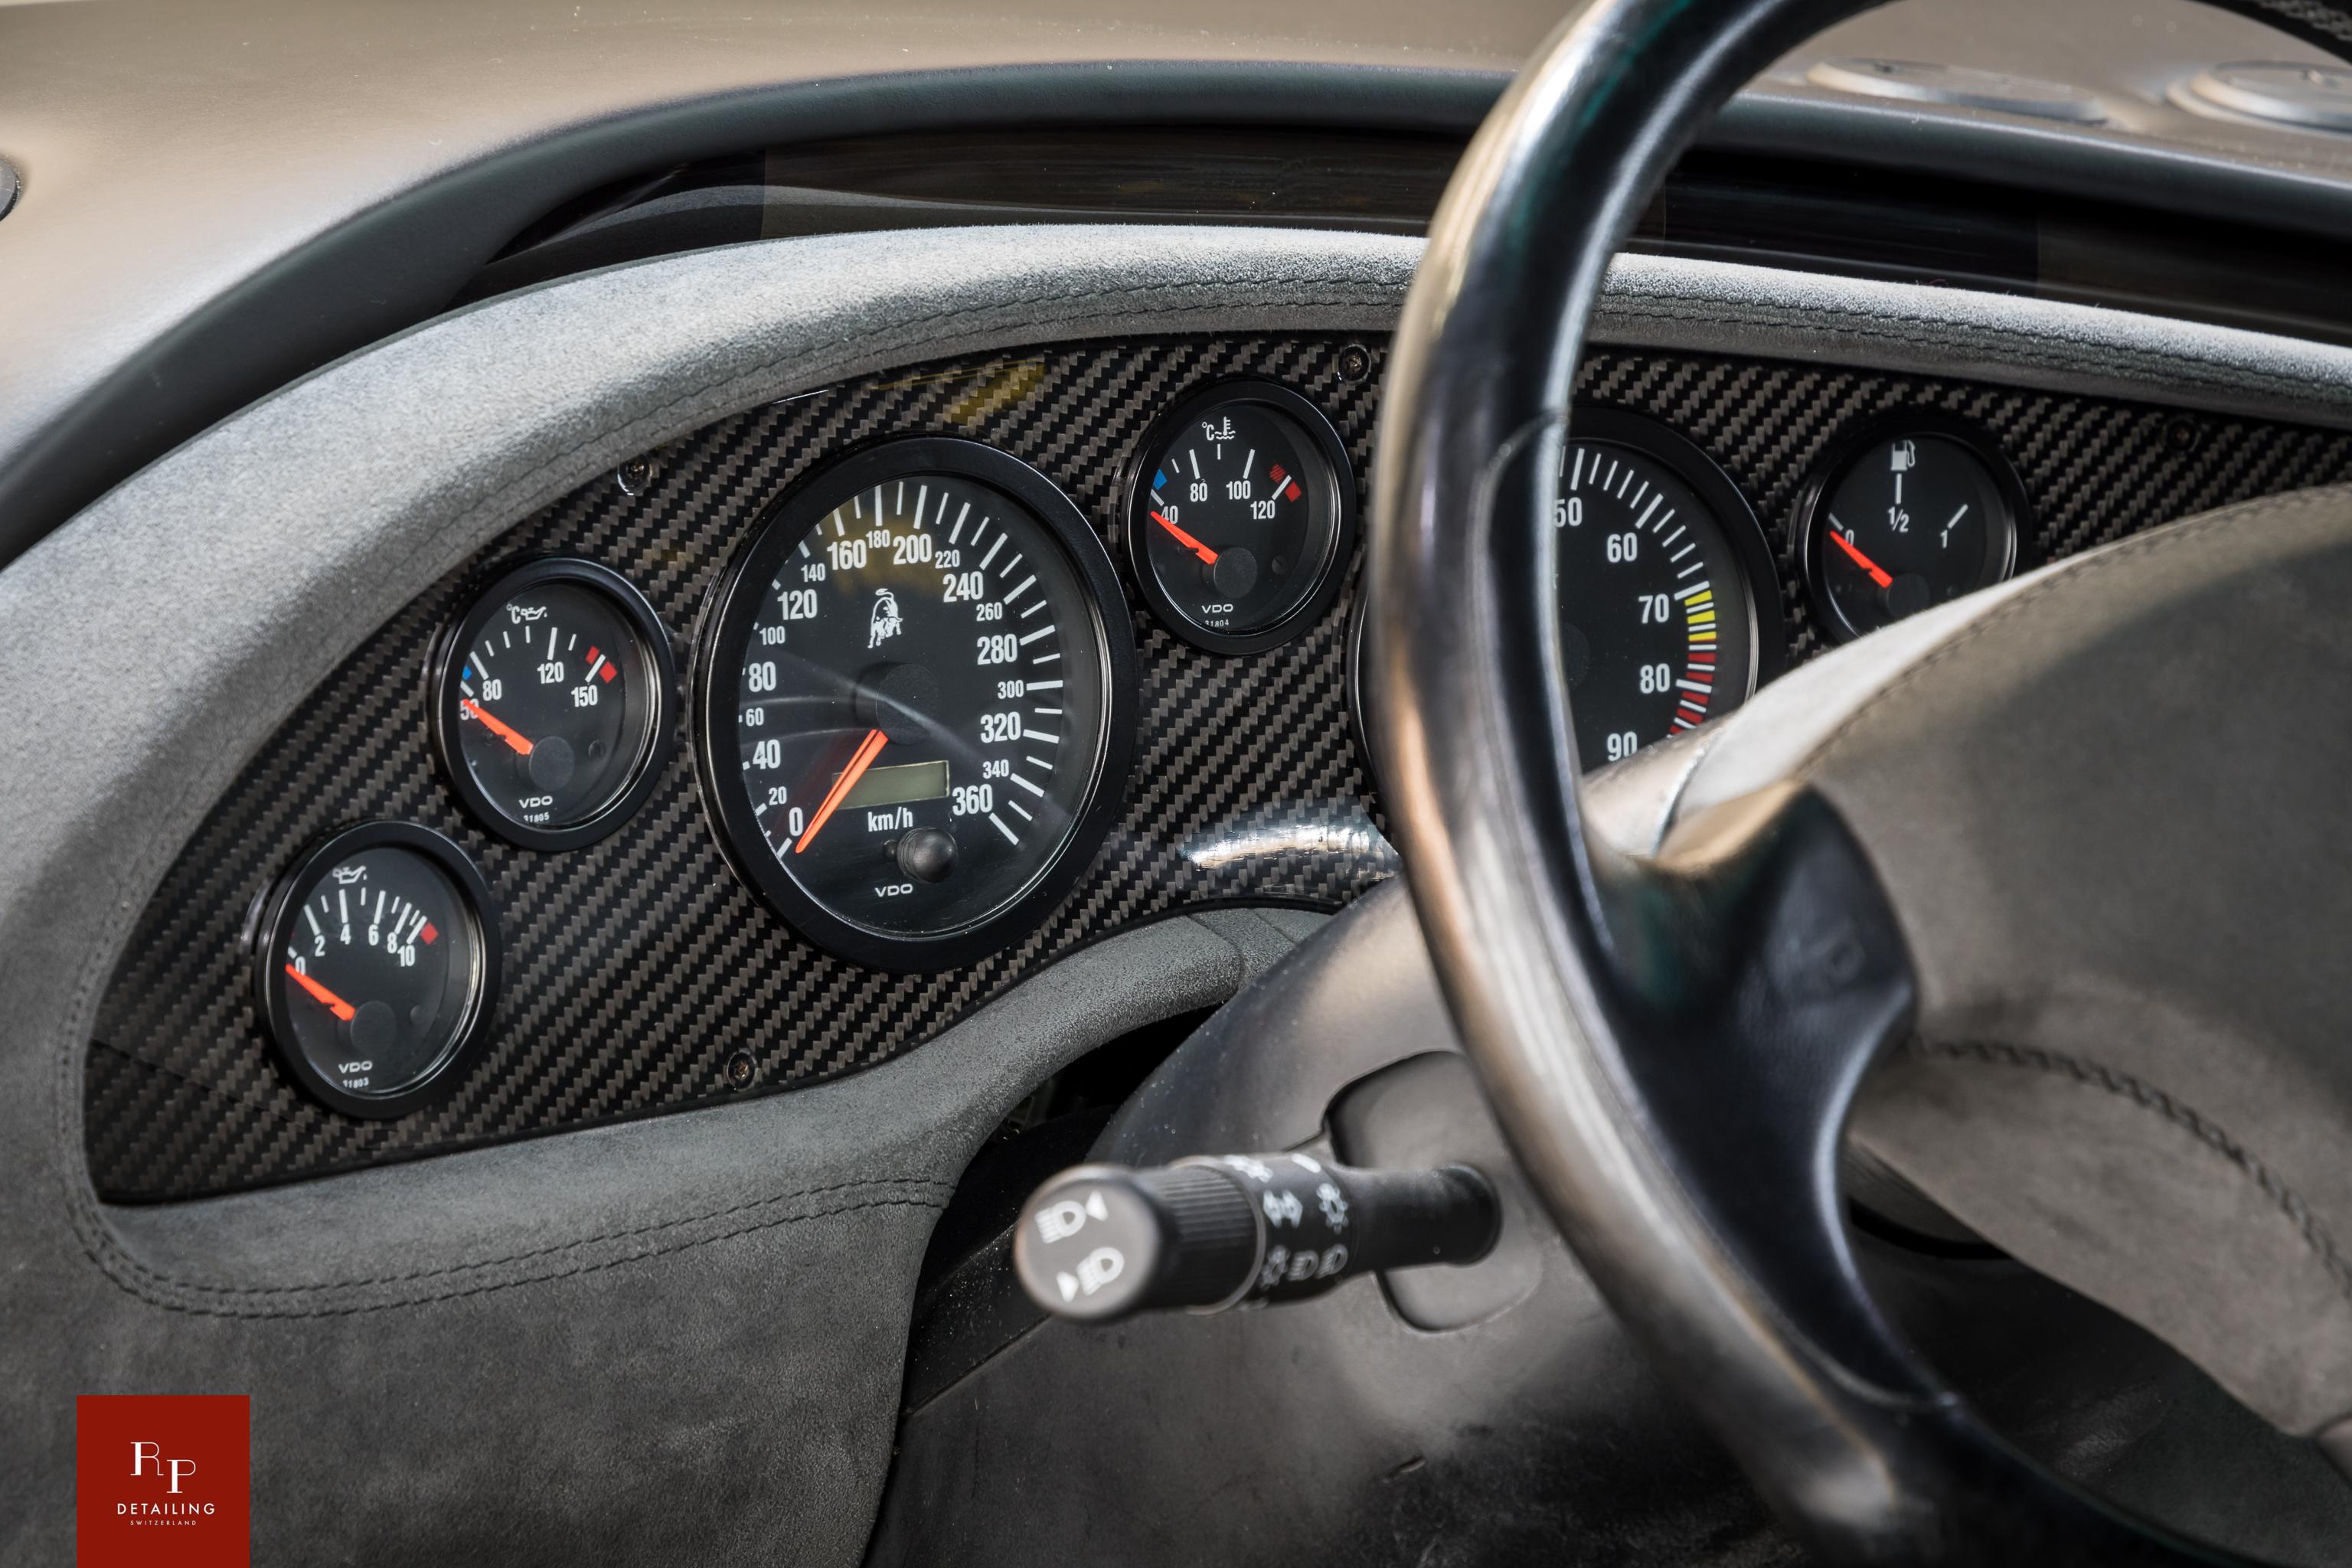 Lamborghini%20Diablo%20GT%20RP%206.jpg